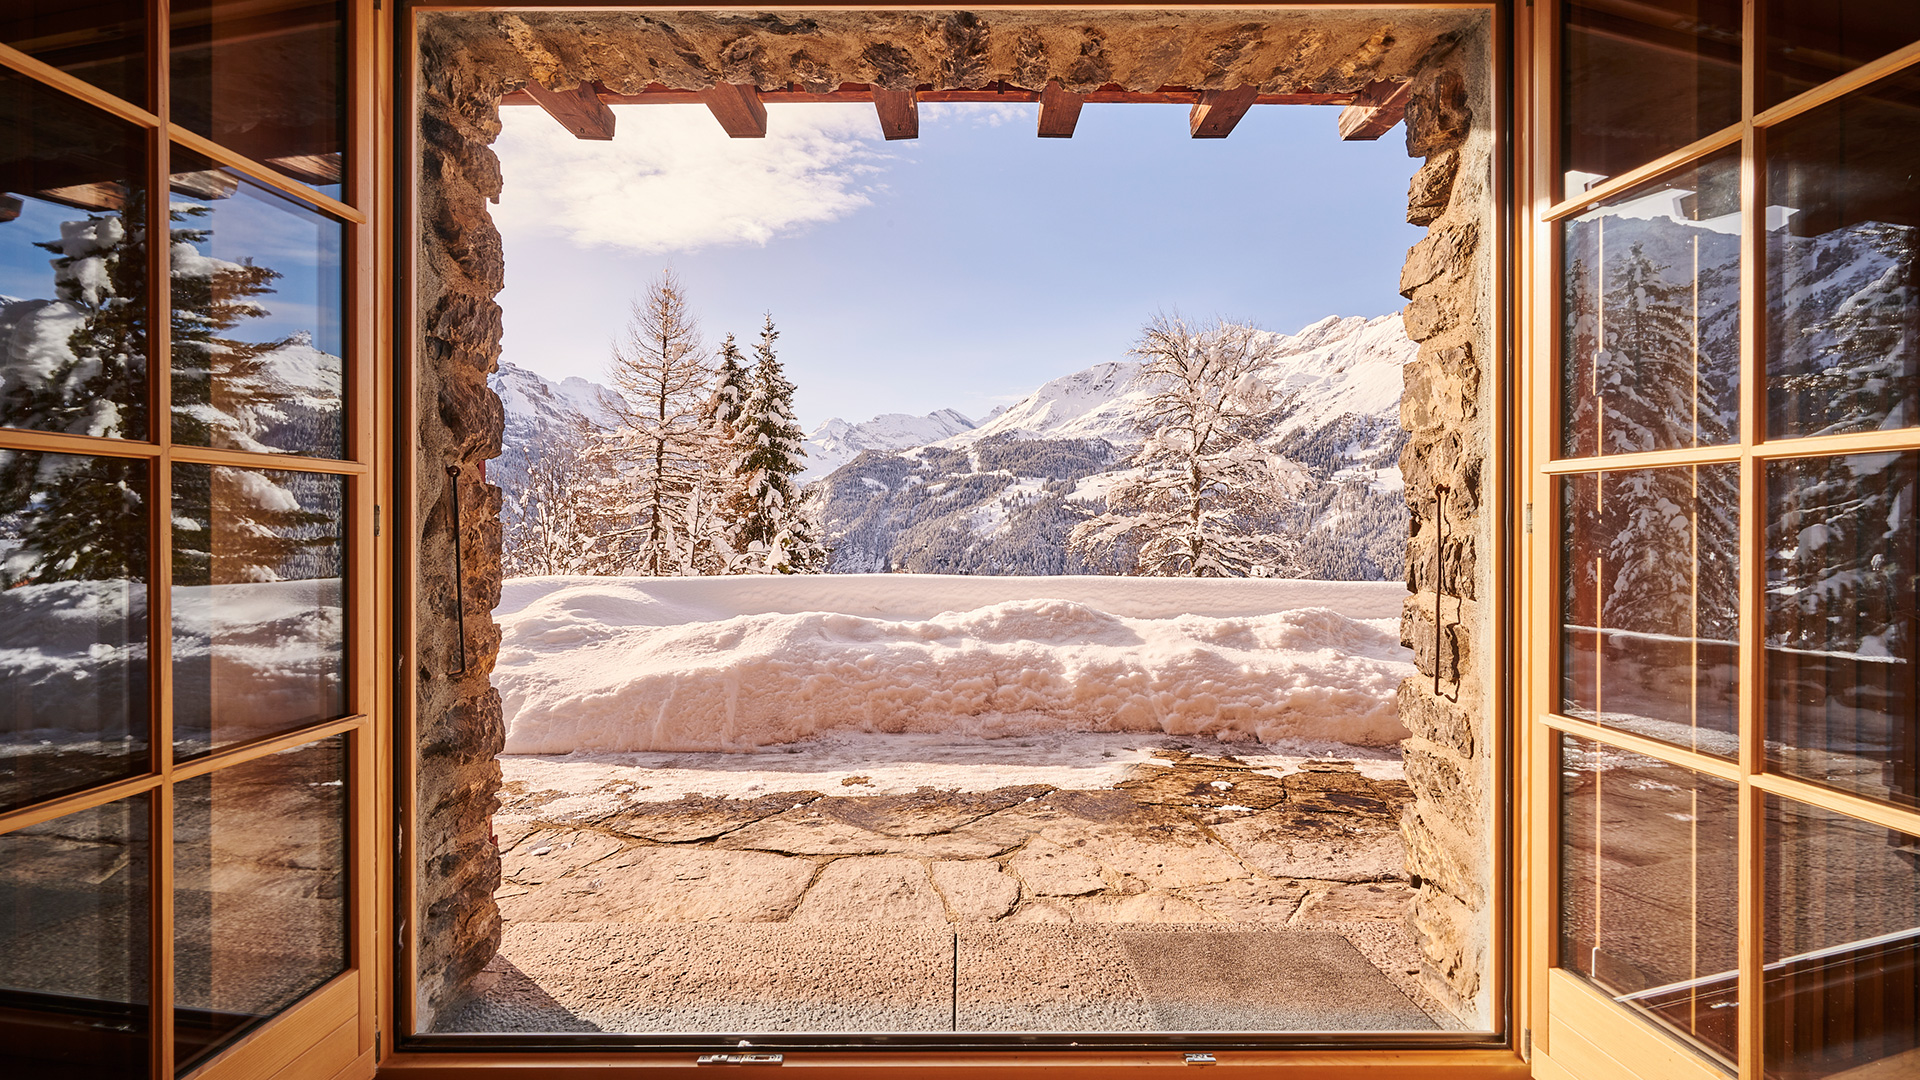 Chalet Yowo Chalet, Switzerland